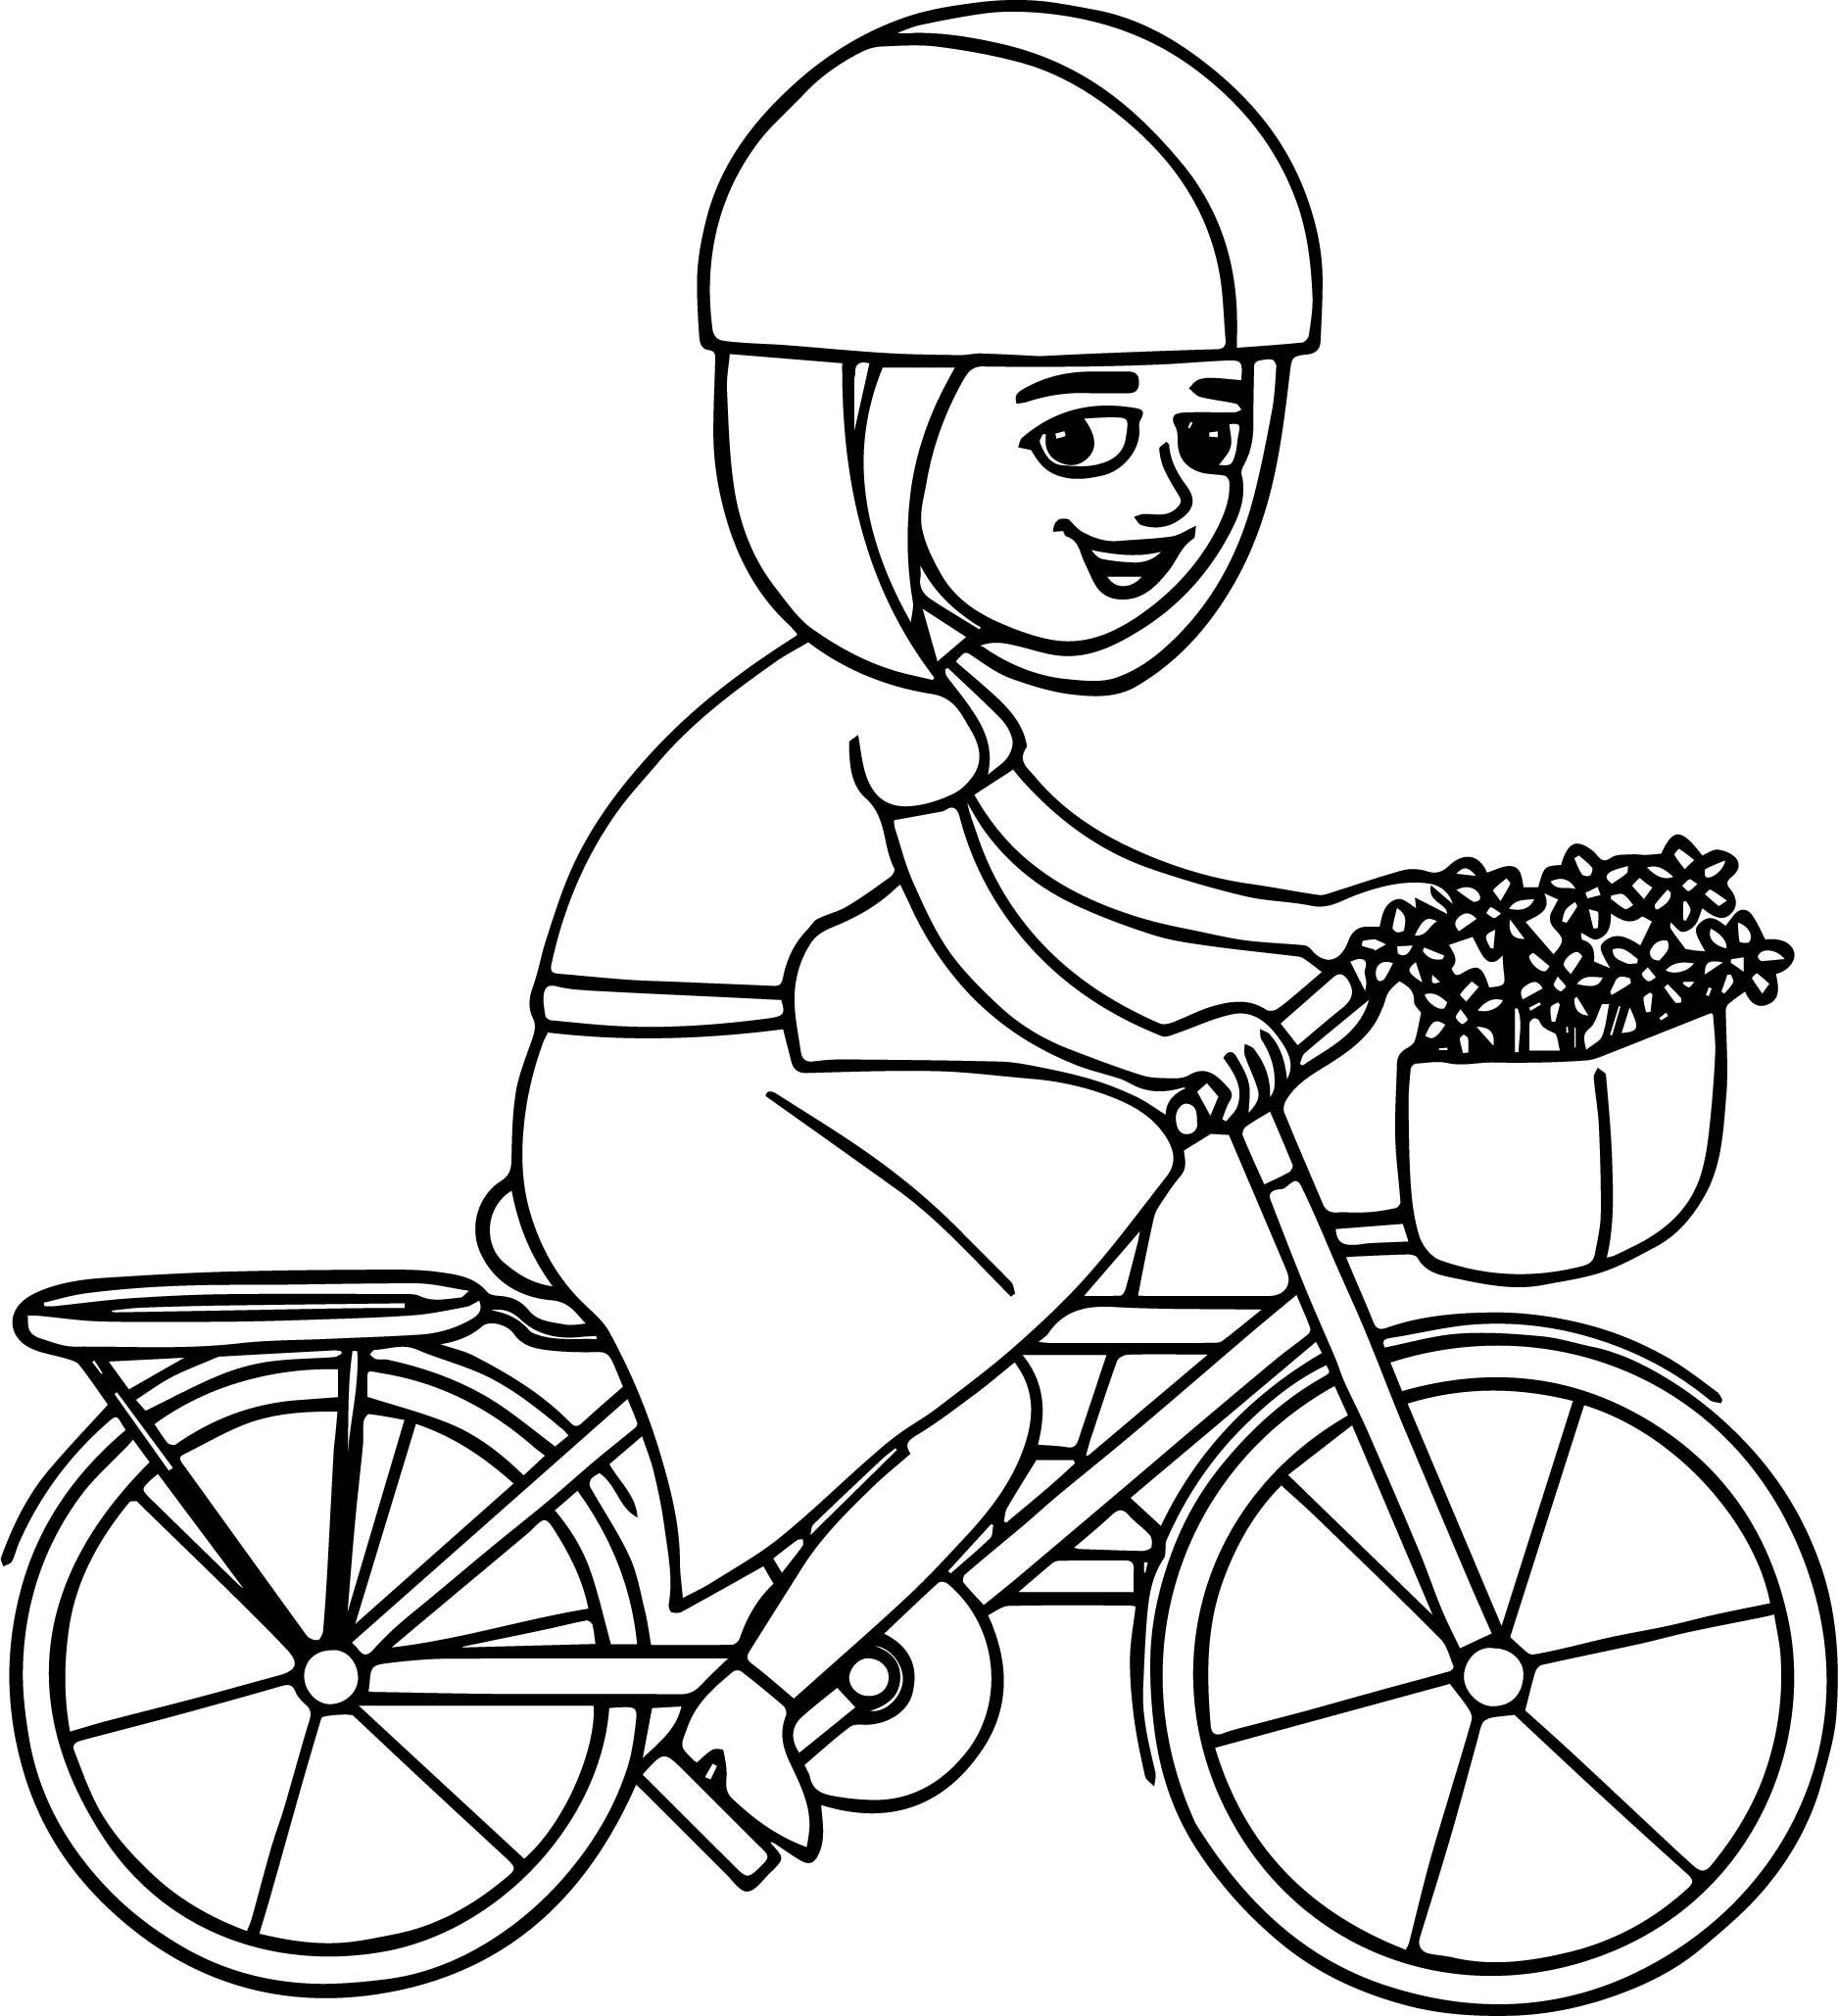 Bike Drawing For Kids At Getdrawings